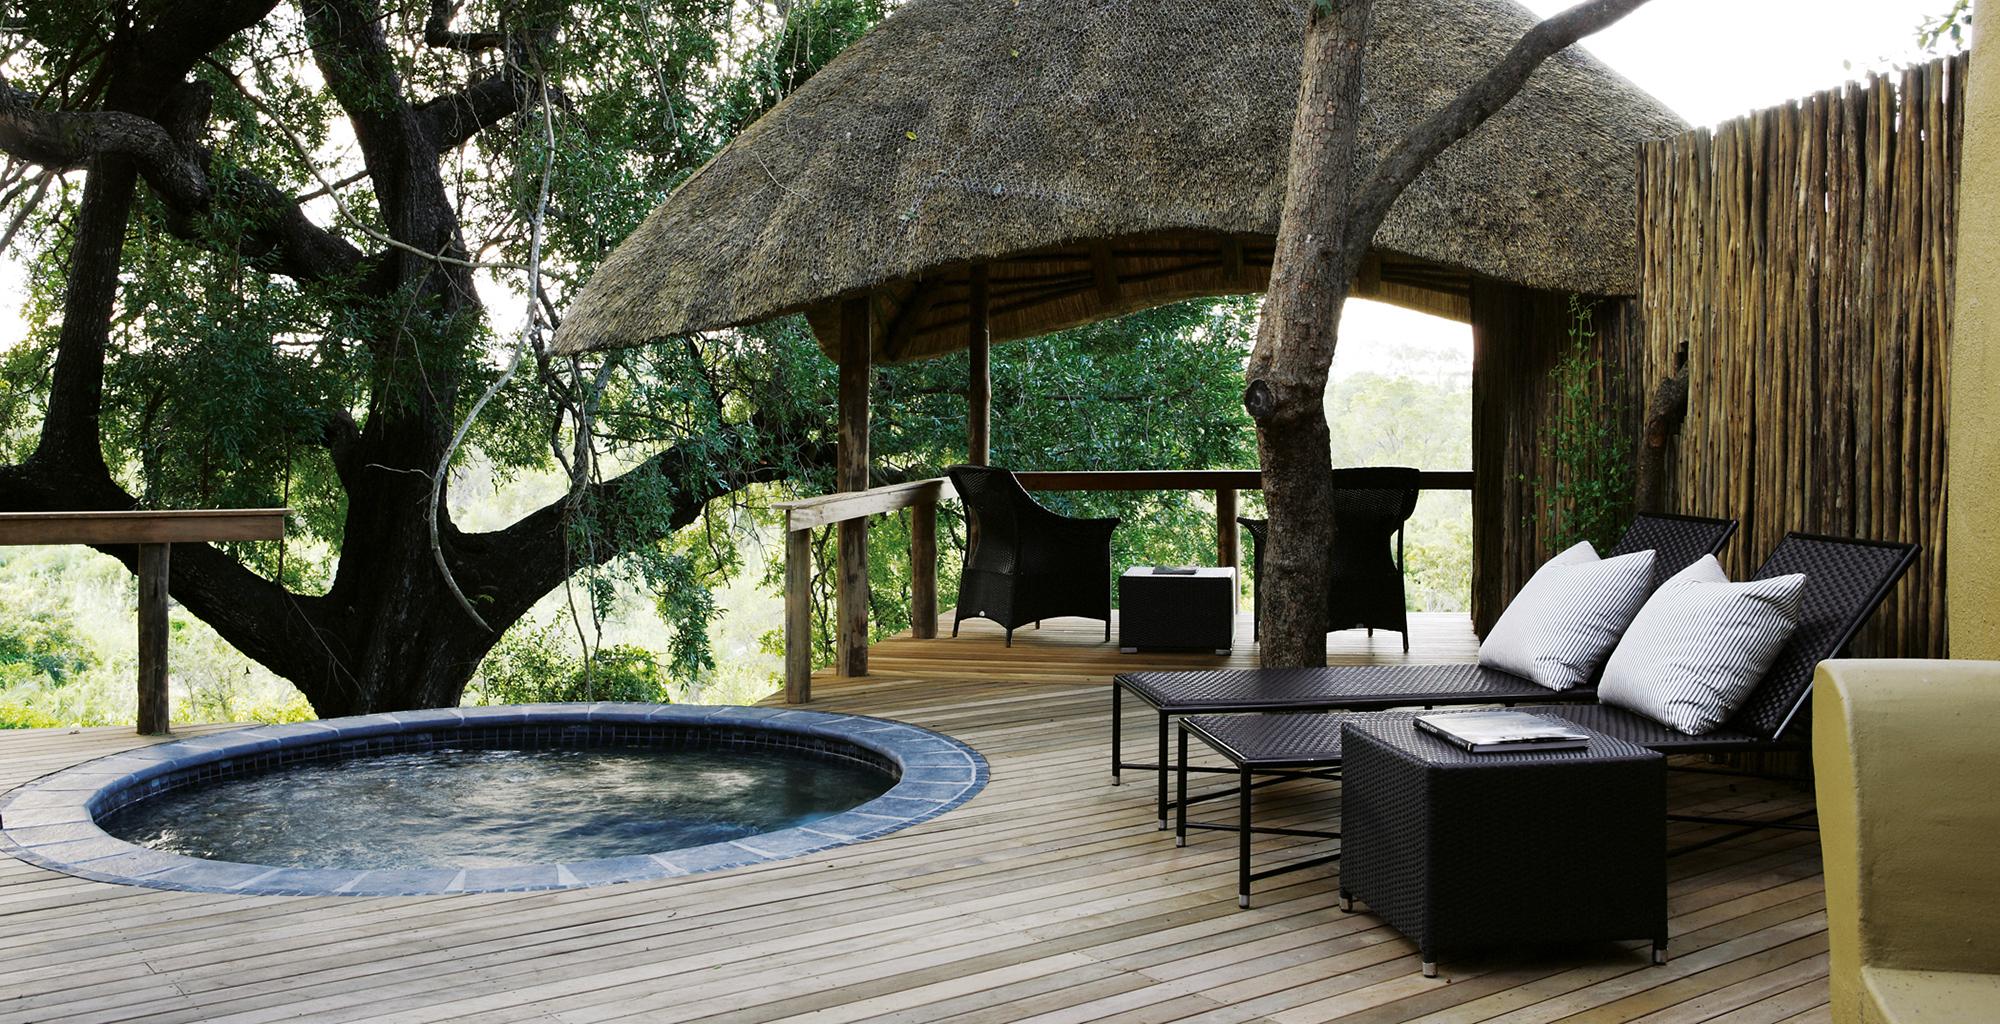 South-Africa-Kruger-Londolozi-Deck